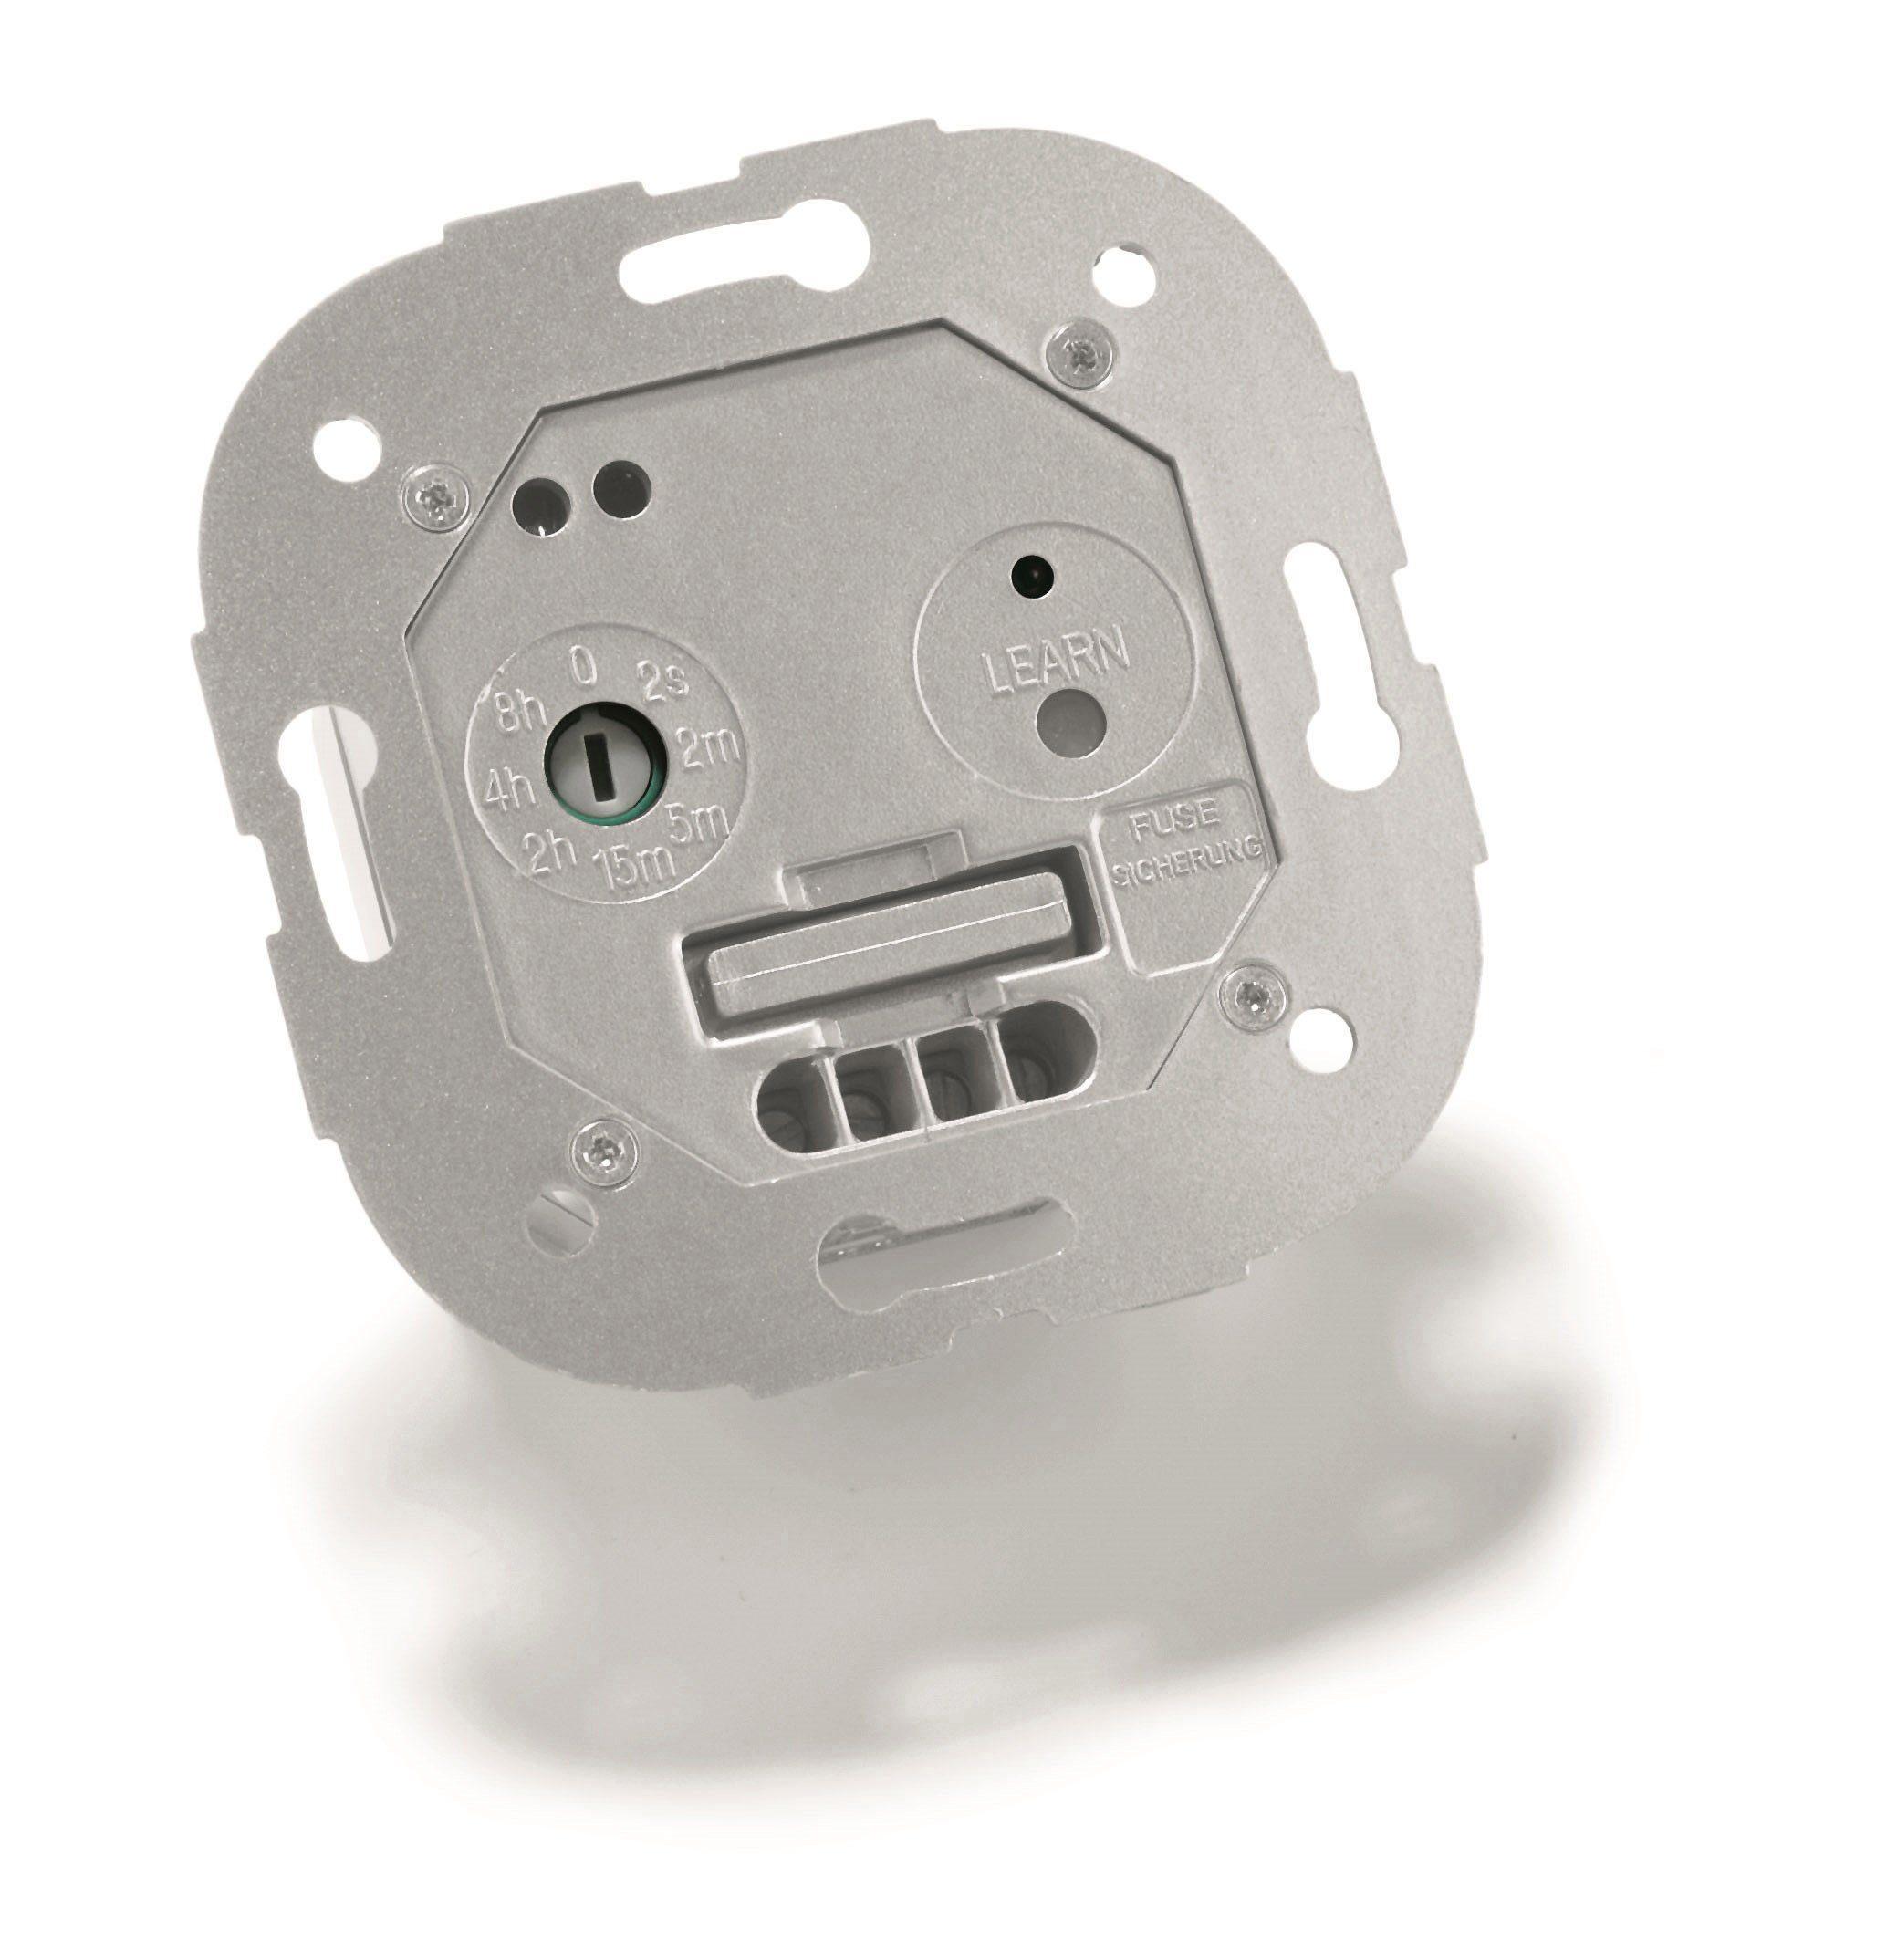 intertechno - Smart Home - Energie & Komfort »ITL-1000 Funk-Schalter / Zeitschalter«